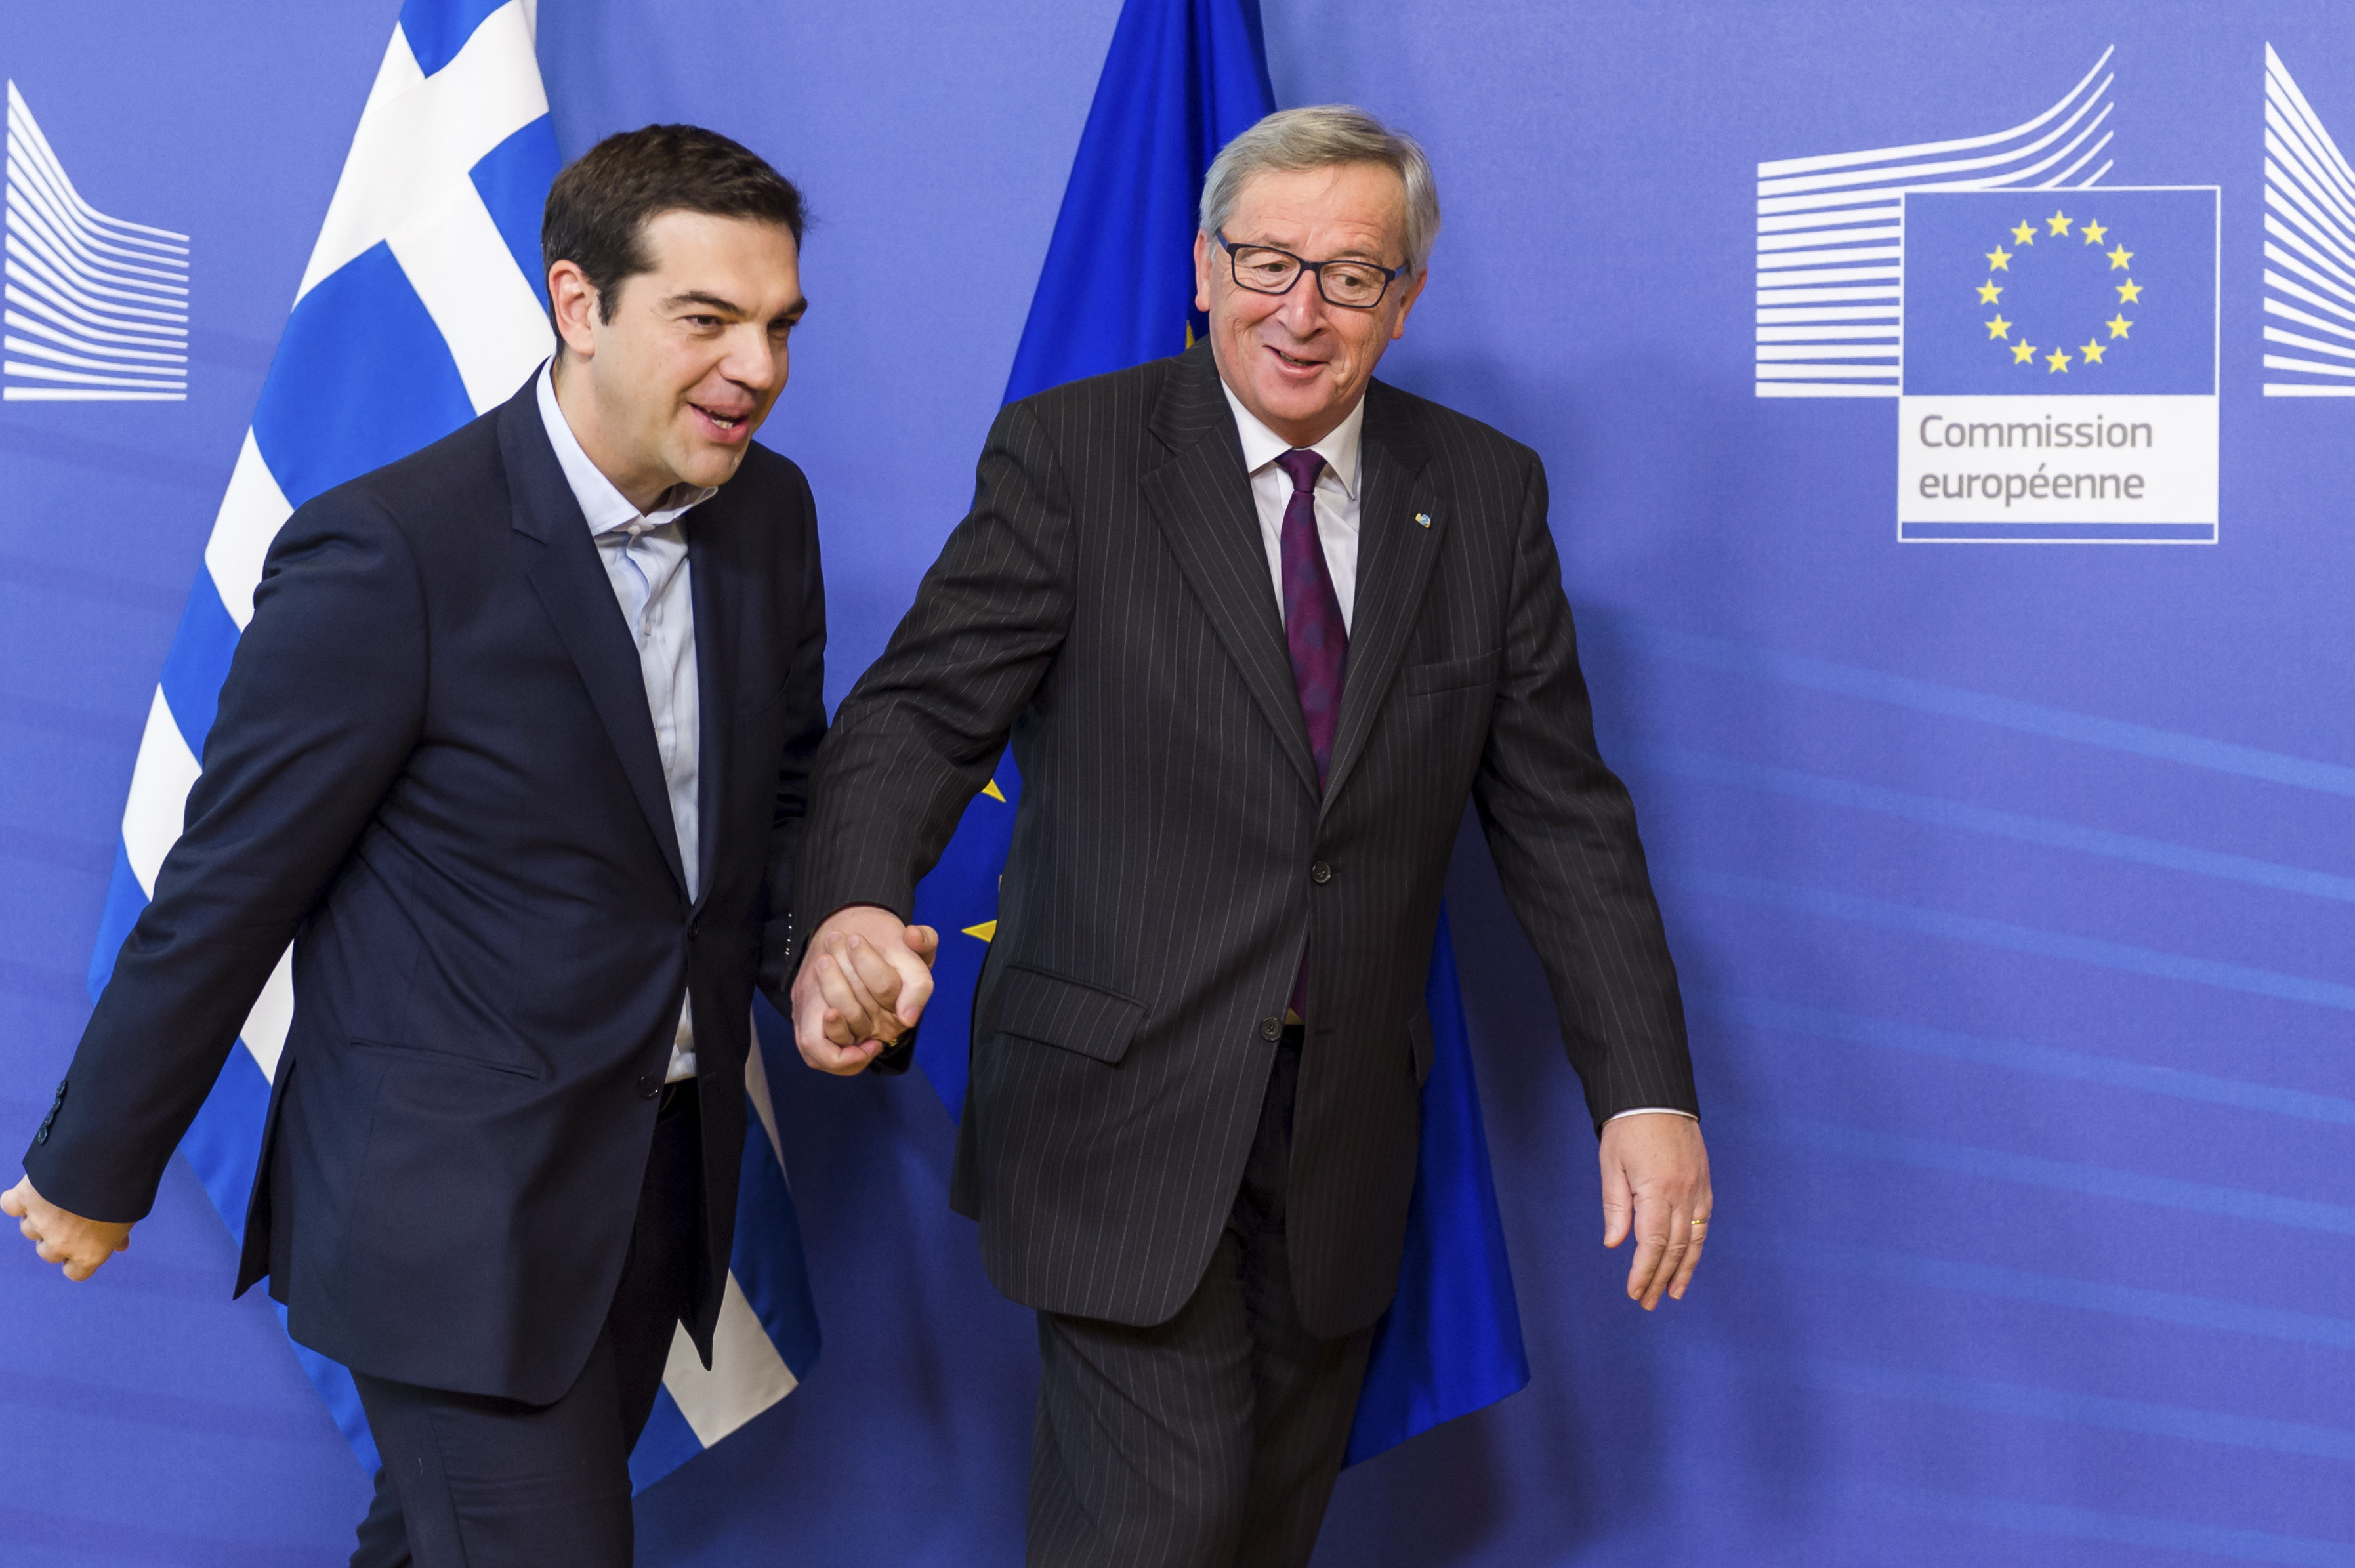 jeanclaude juncker tsipras